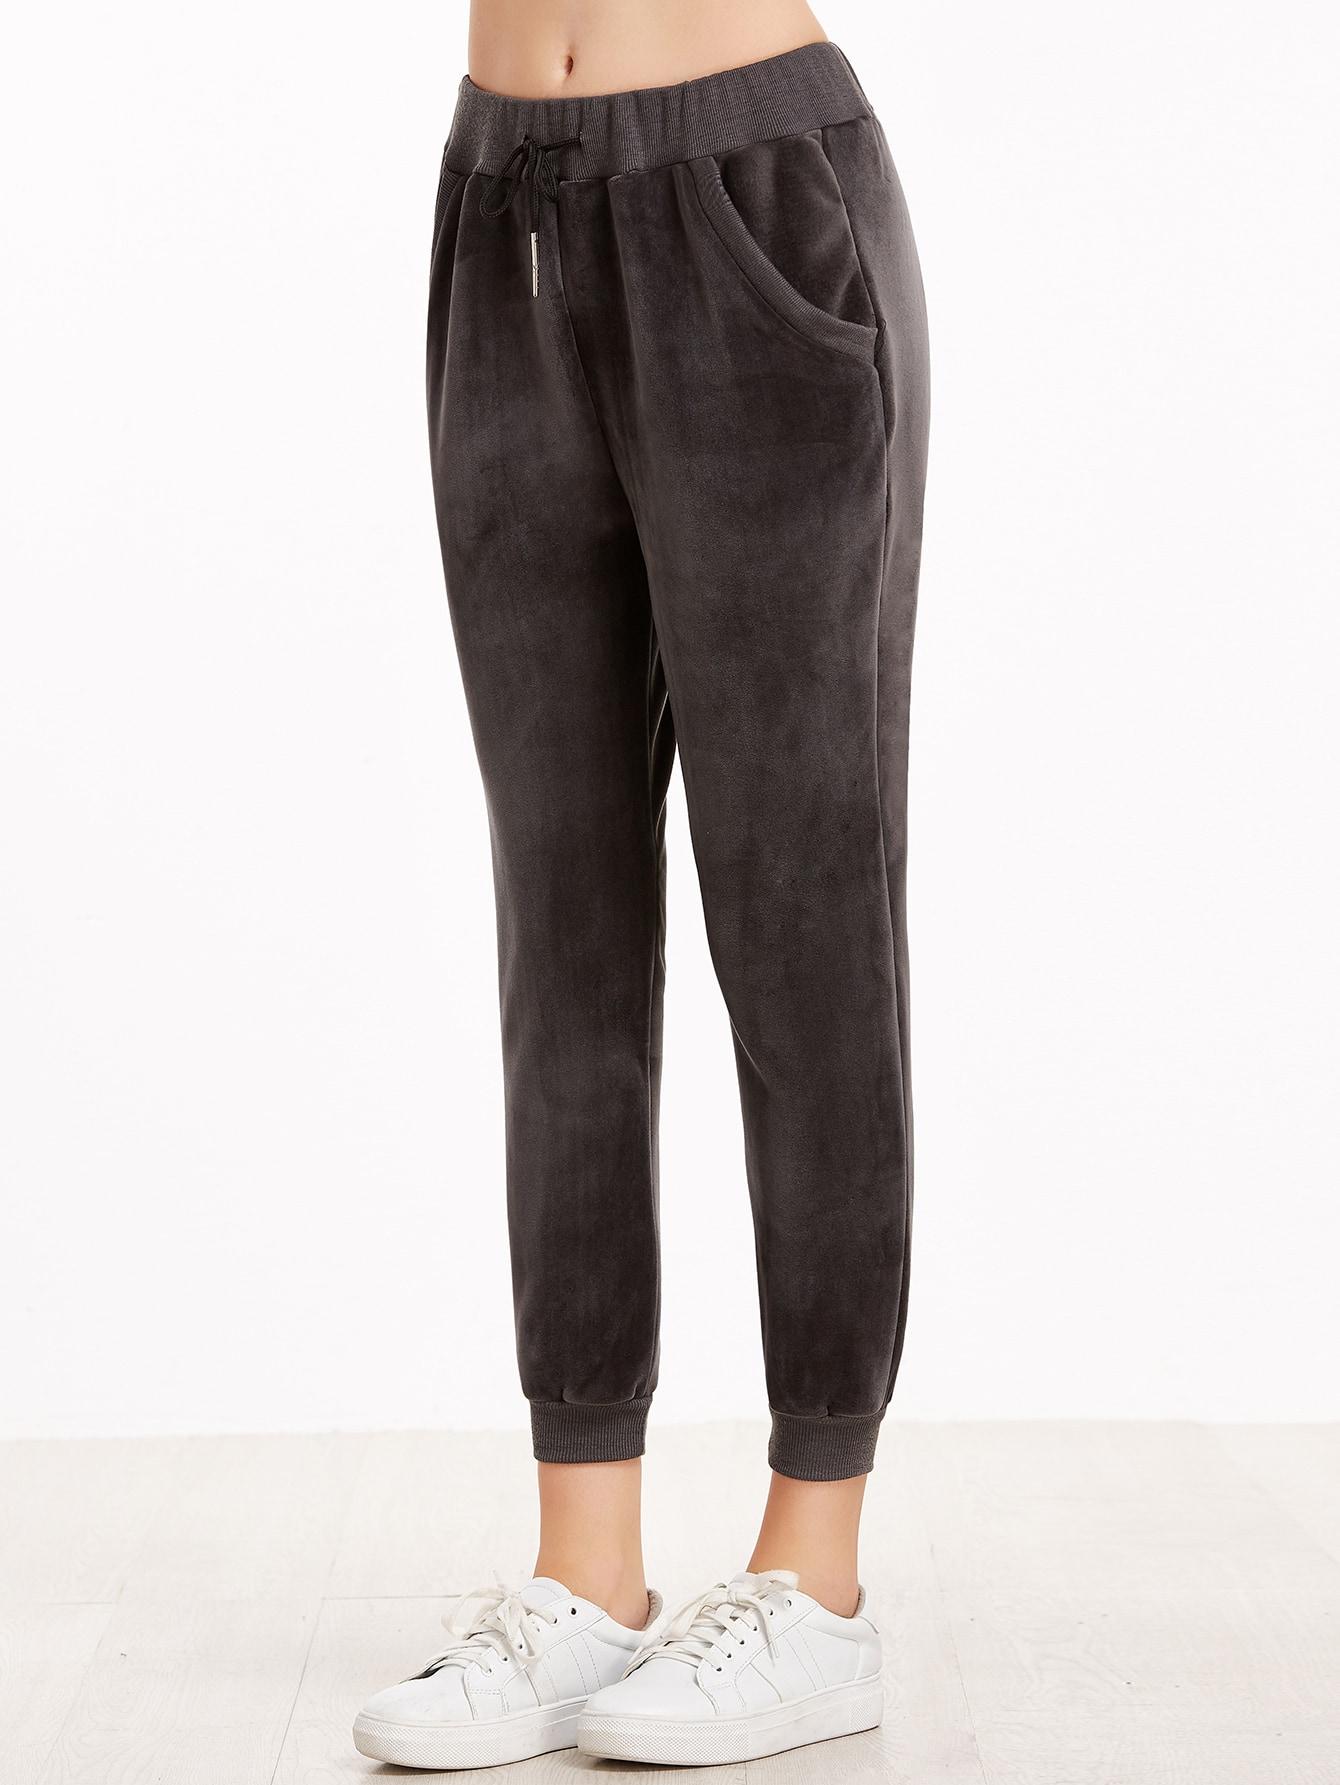 Dark Grey Drawstring Ribbed Trim Velvet Pants pants161202101